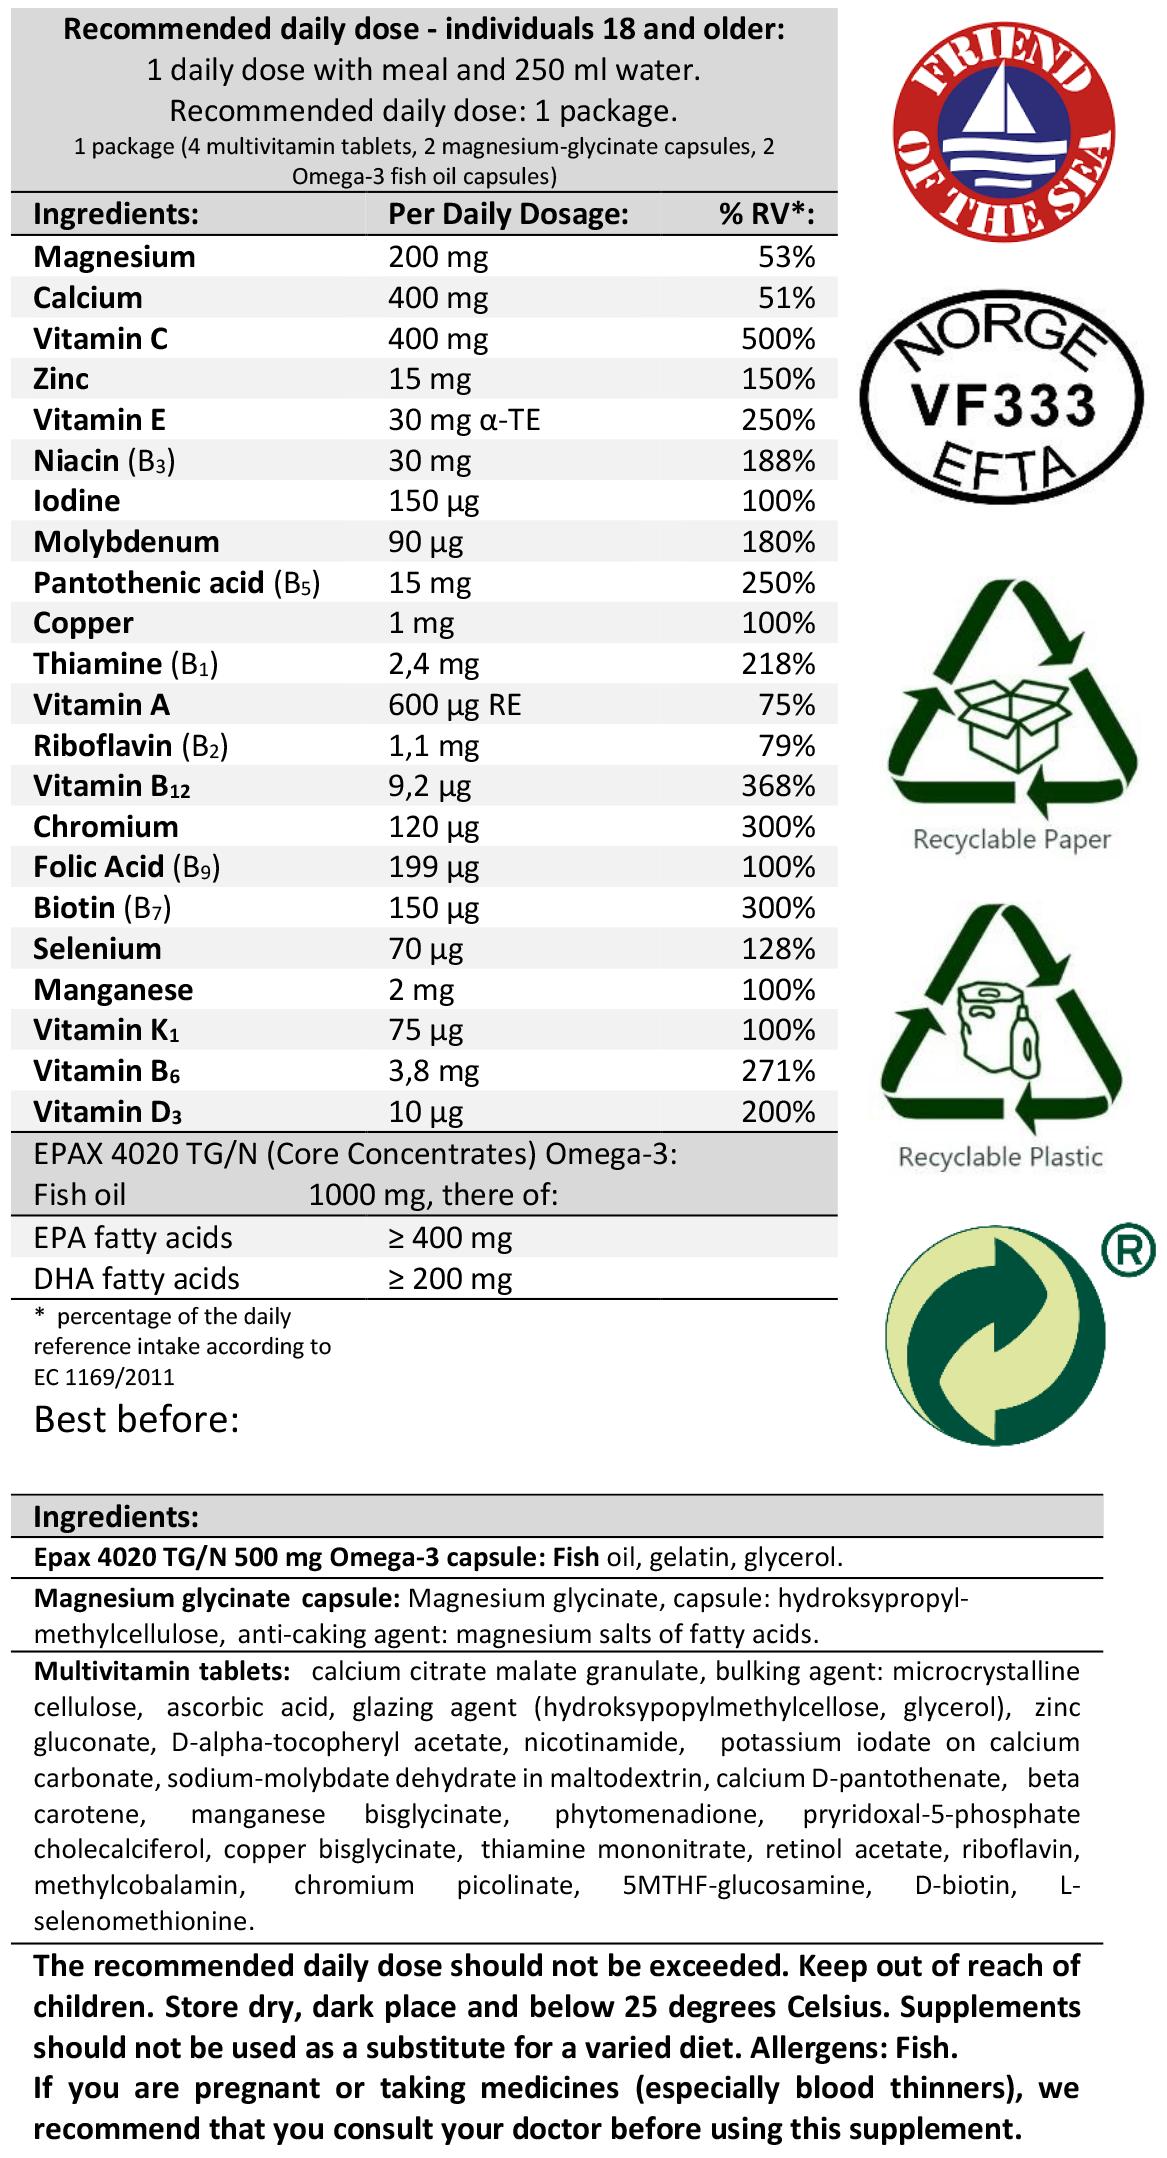 HealthPack Label